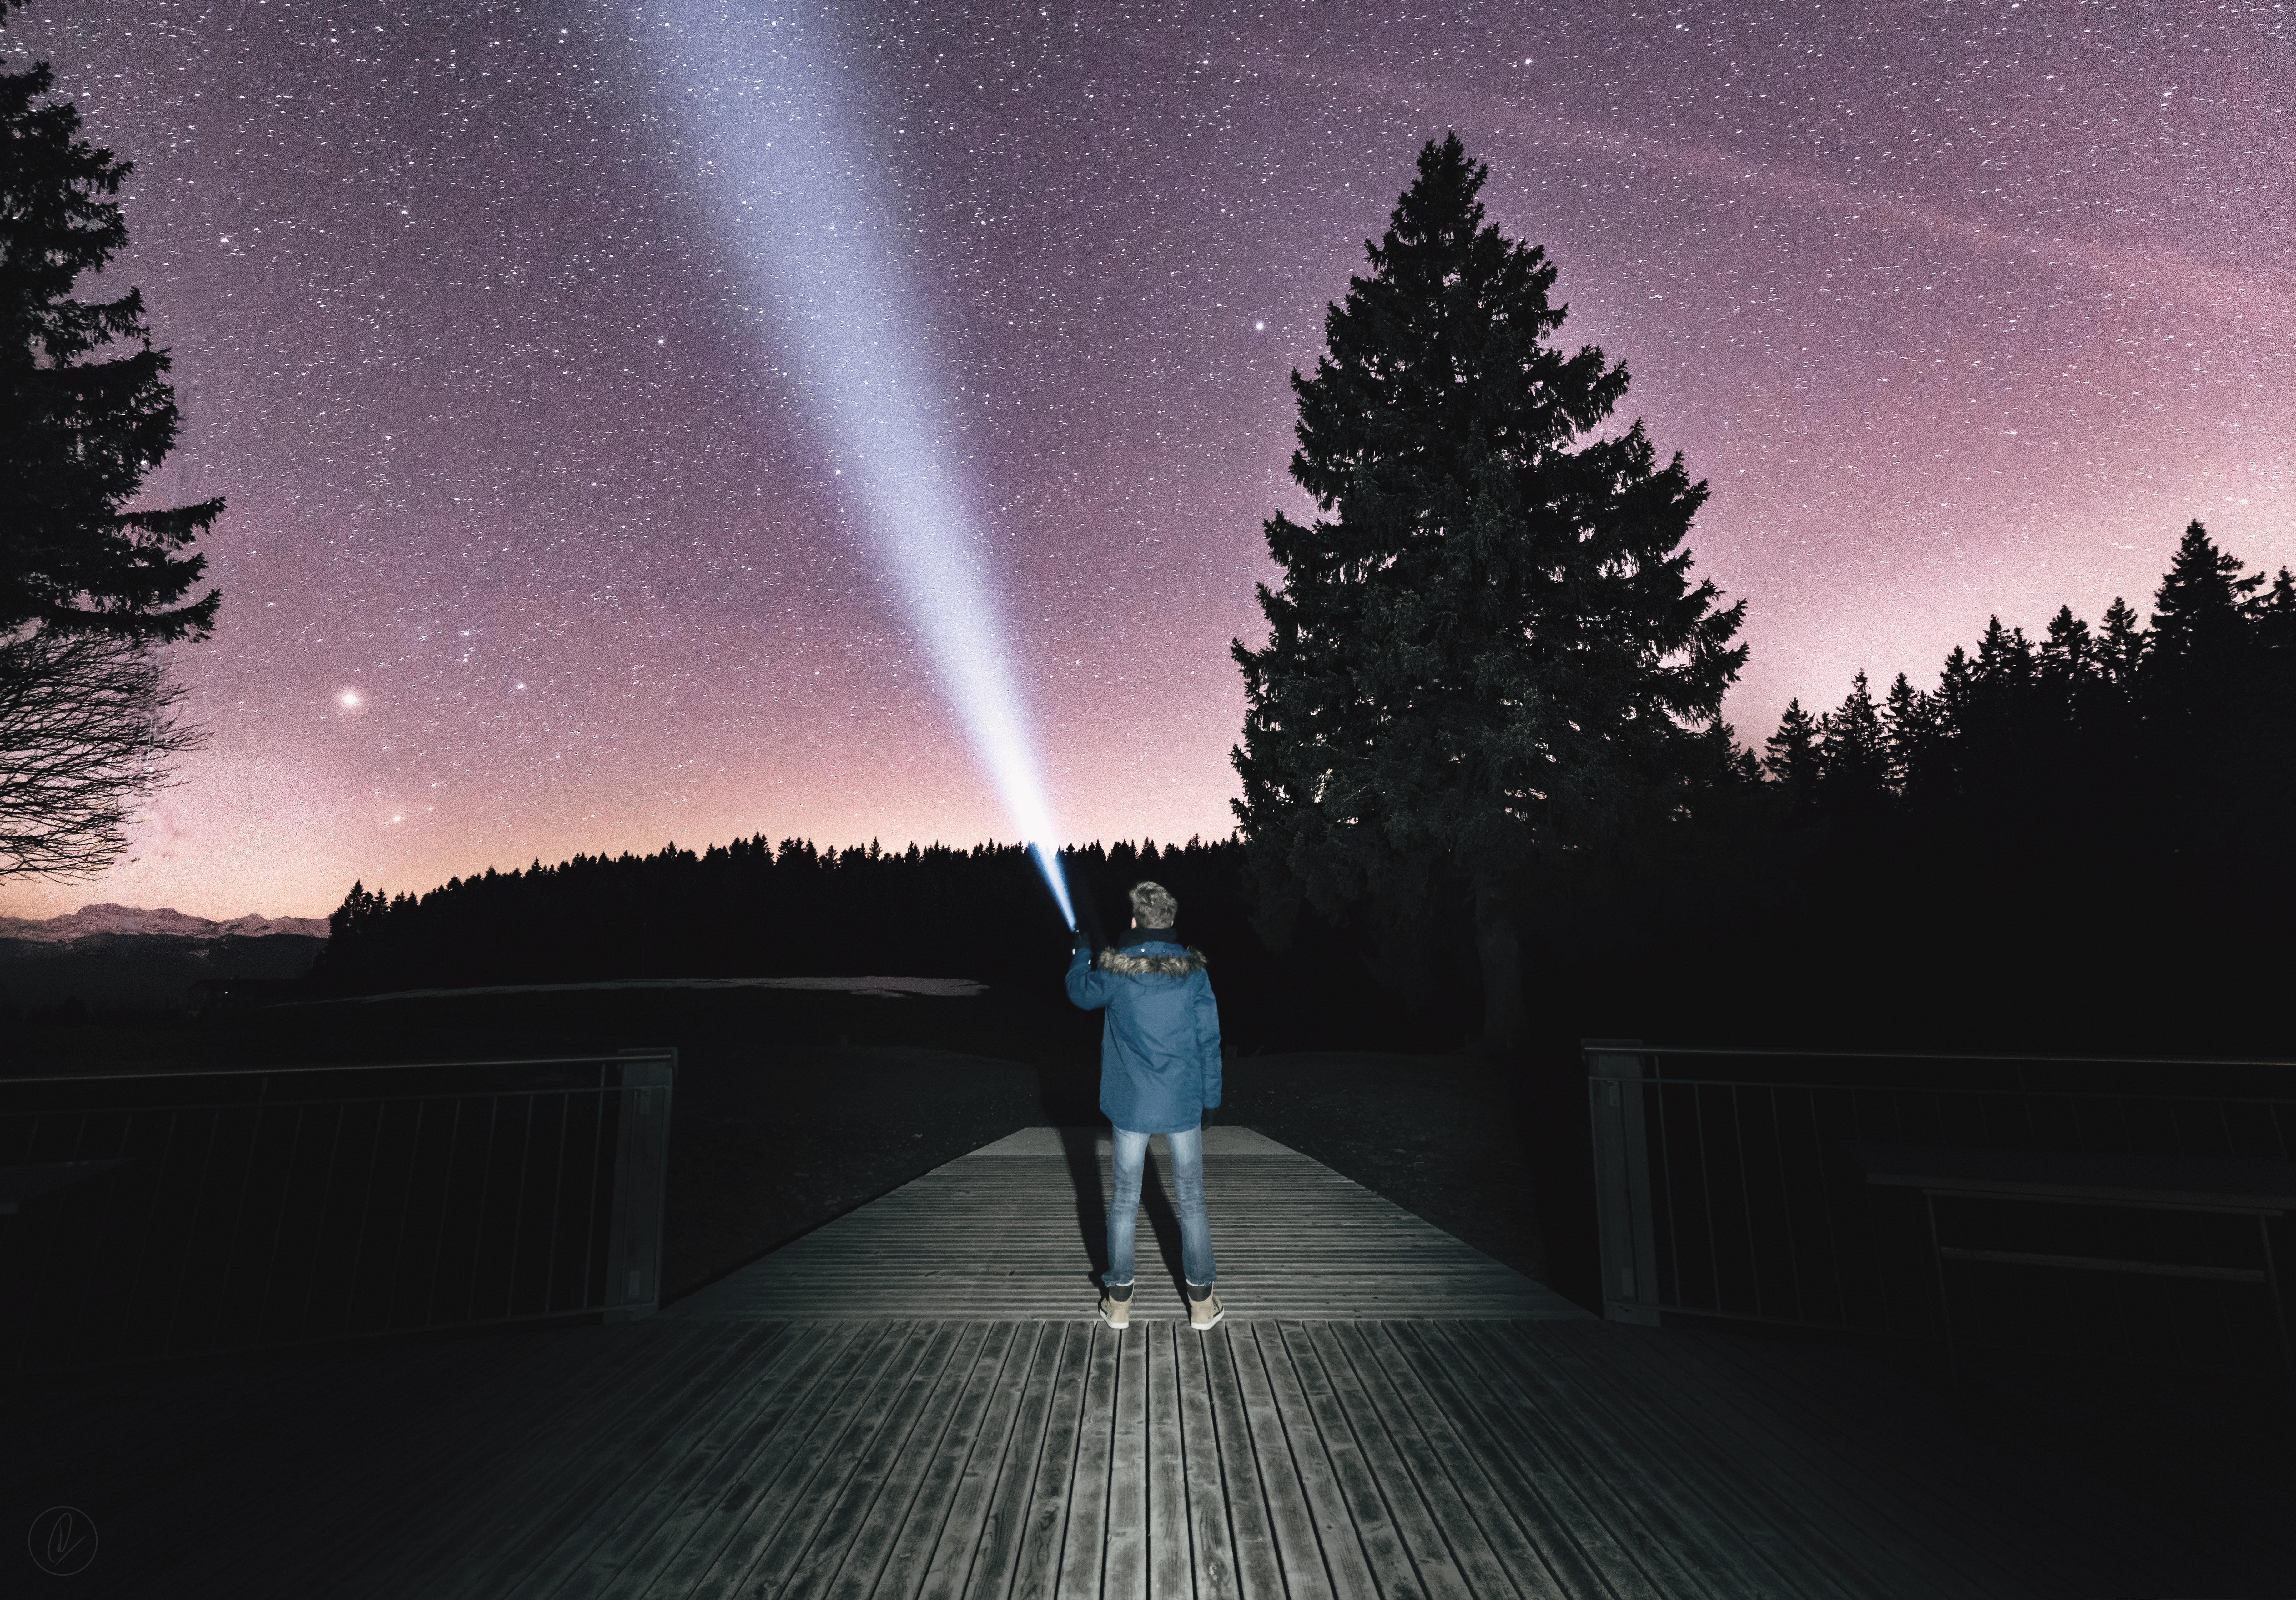 Man shining flashlight at star-filled night sky; image by Dino Reichmuth, via Unsplash.com.